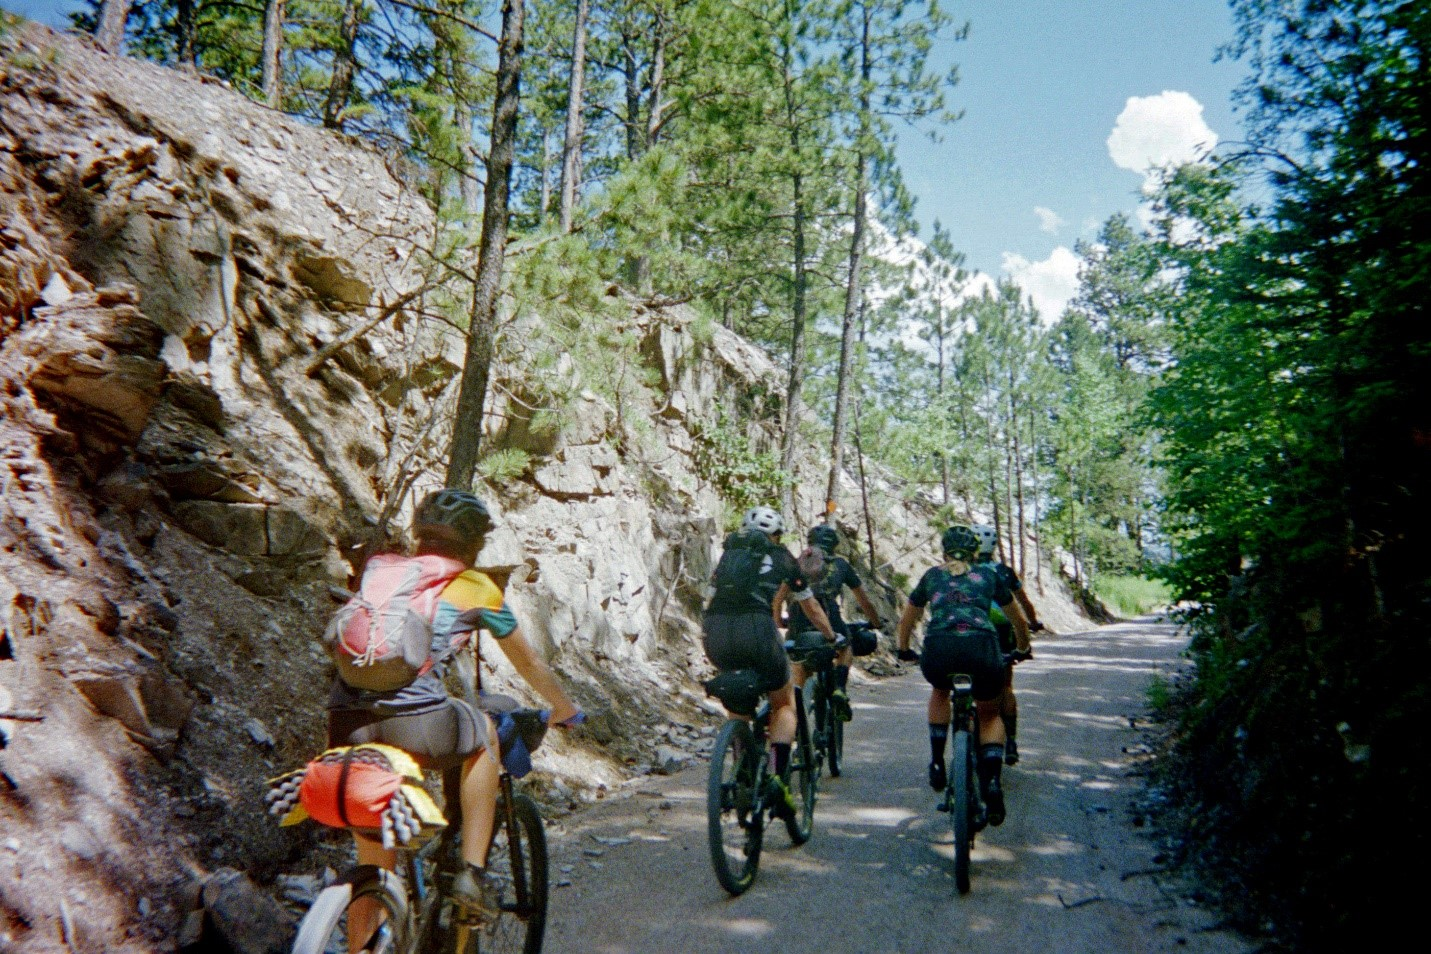 Cycling the Mickelson near Lead, South Dakota